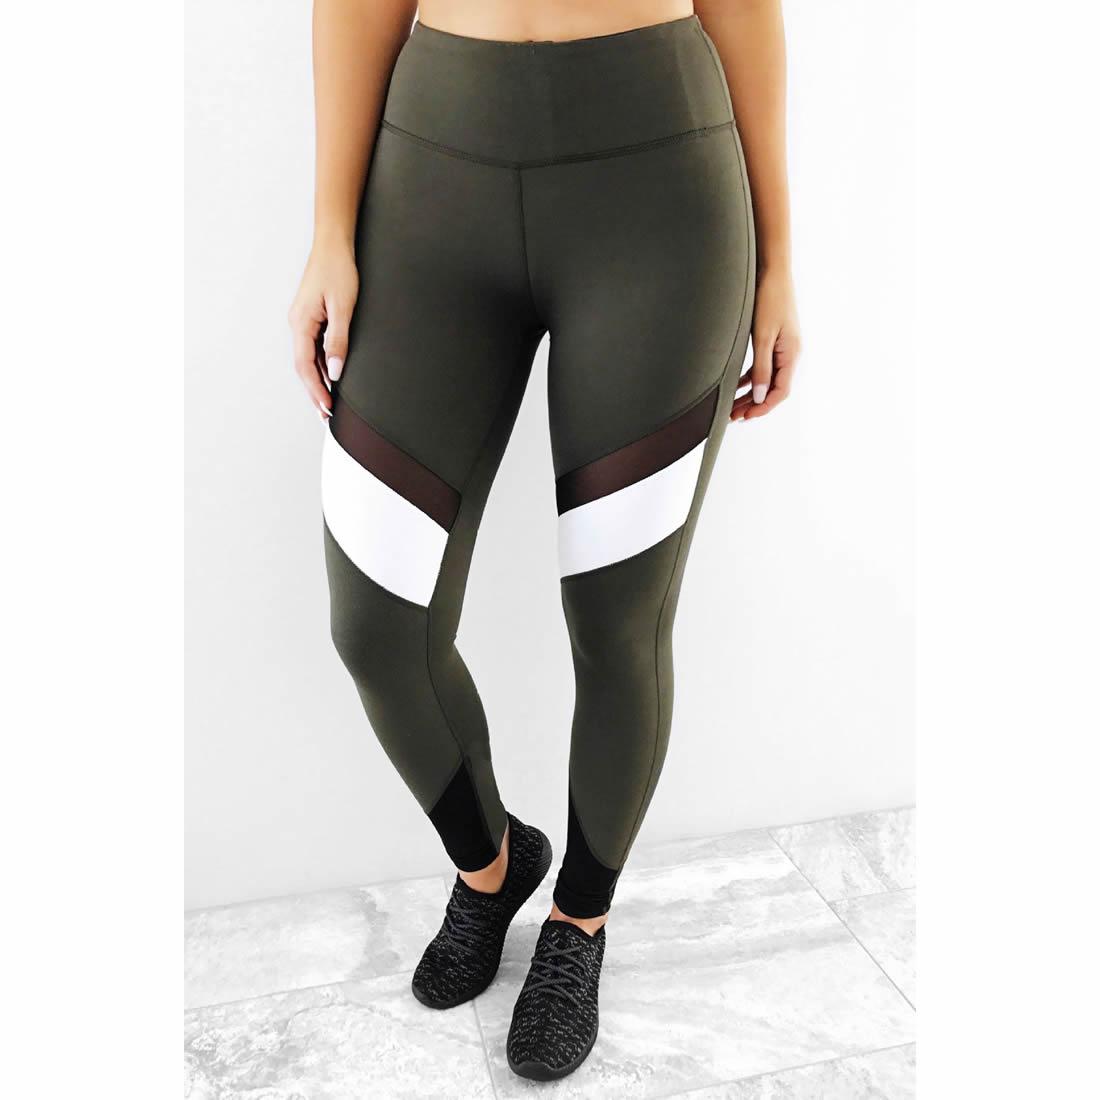 Spandex & Polyester Women Yoga Pants & transparent ...